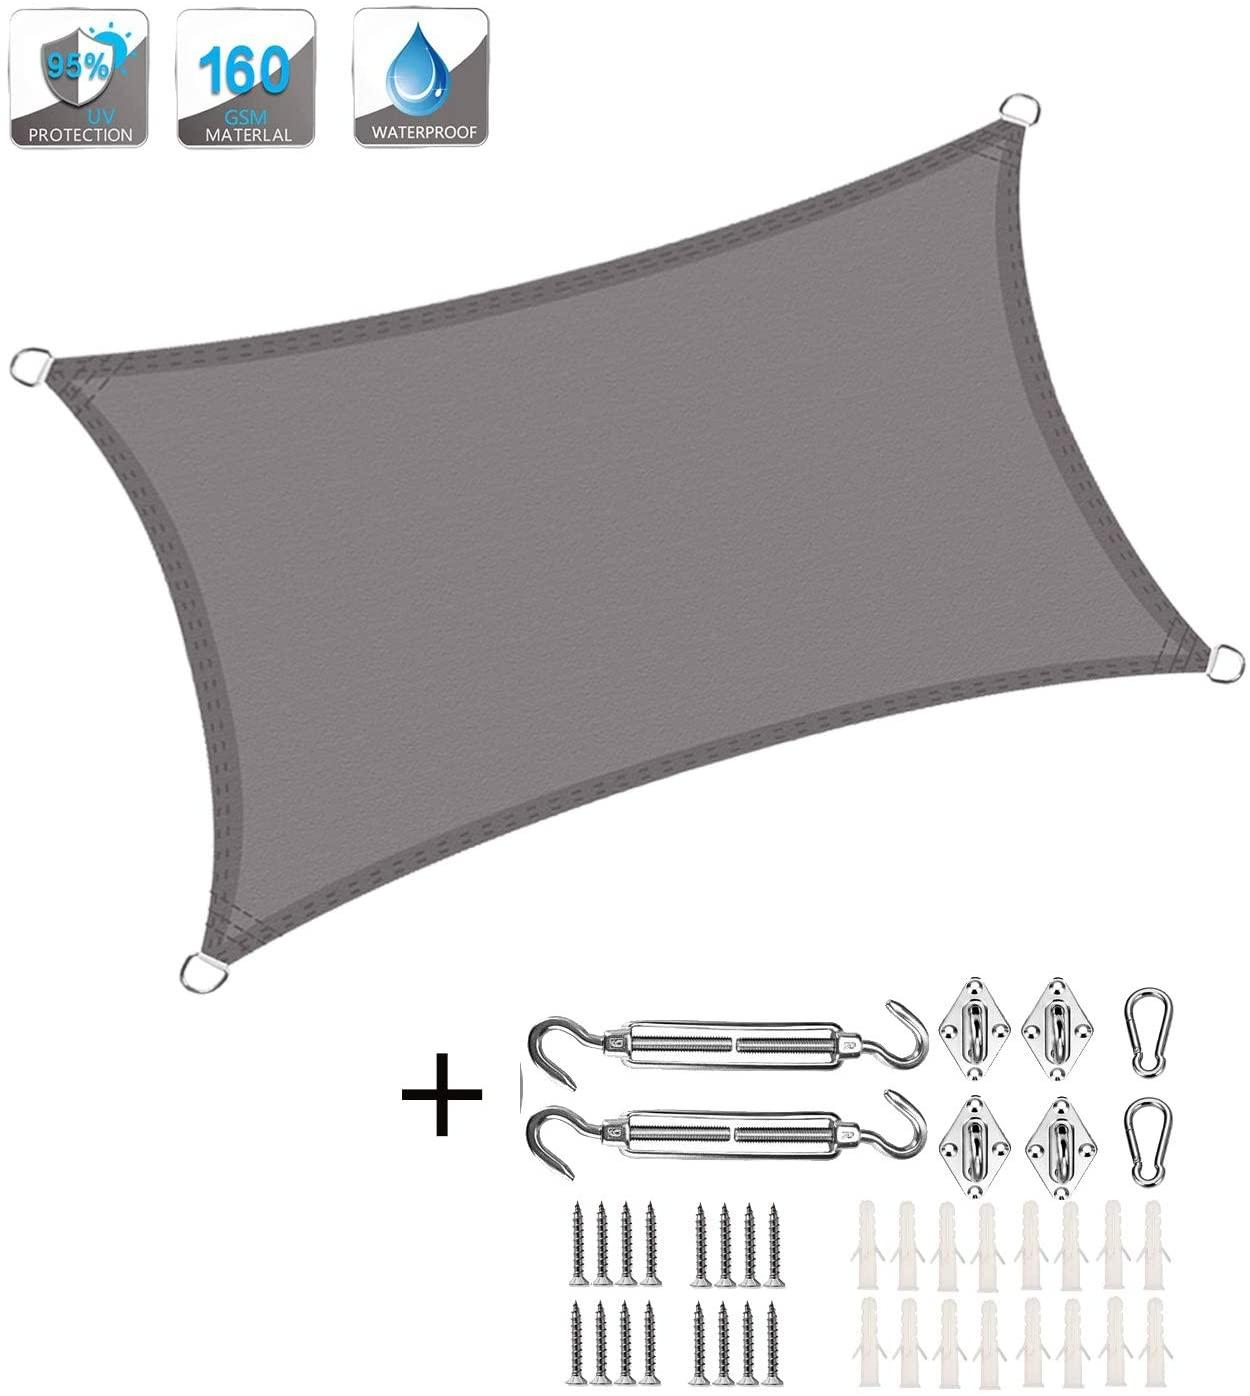 XXJF Sun Shade PermeableuvBlockSunshadeWaterproof Sail Canopy Awning SunshadeFabricPESPolyester forPatioGardenBackyardpergola (Color : Gray, Size : 5x7.5m)